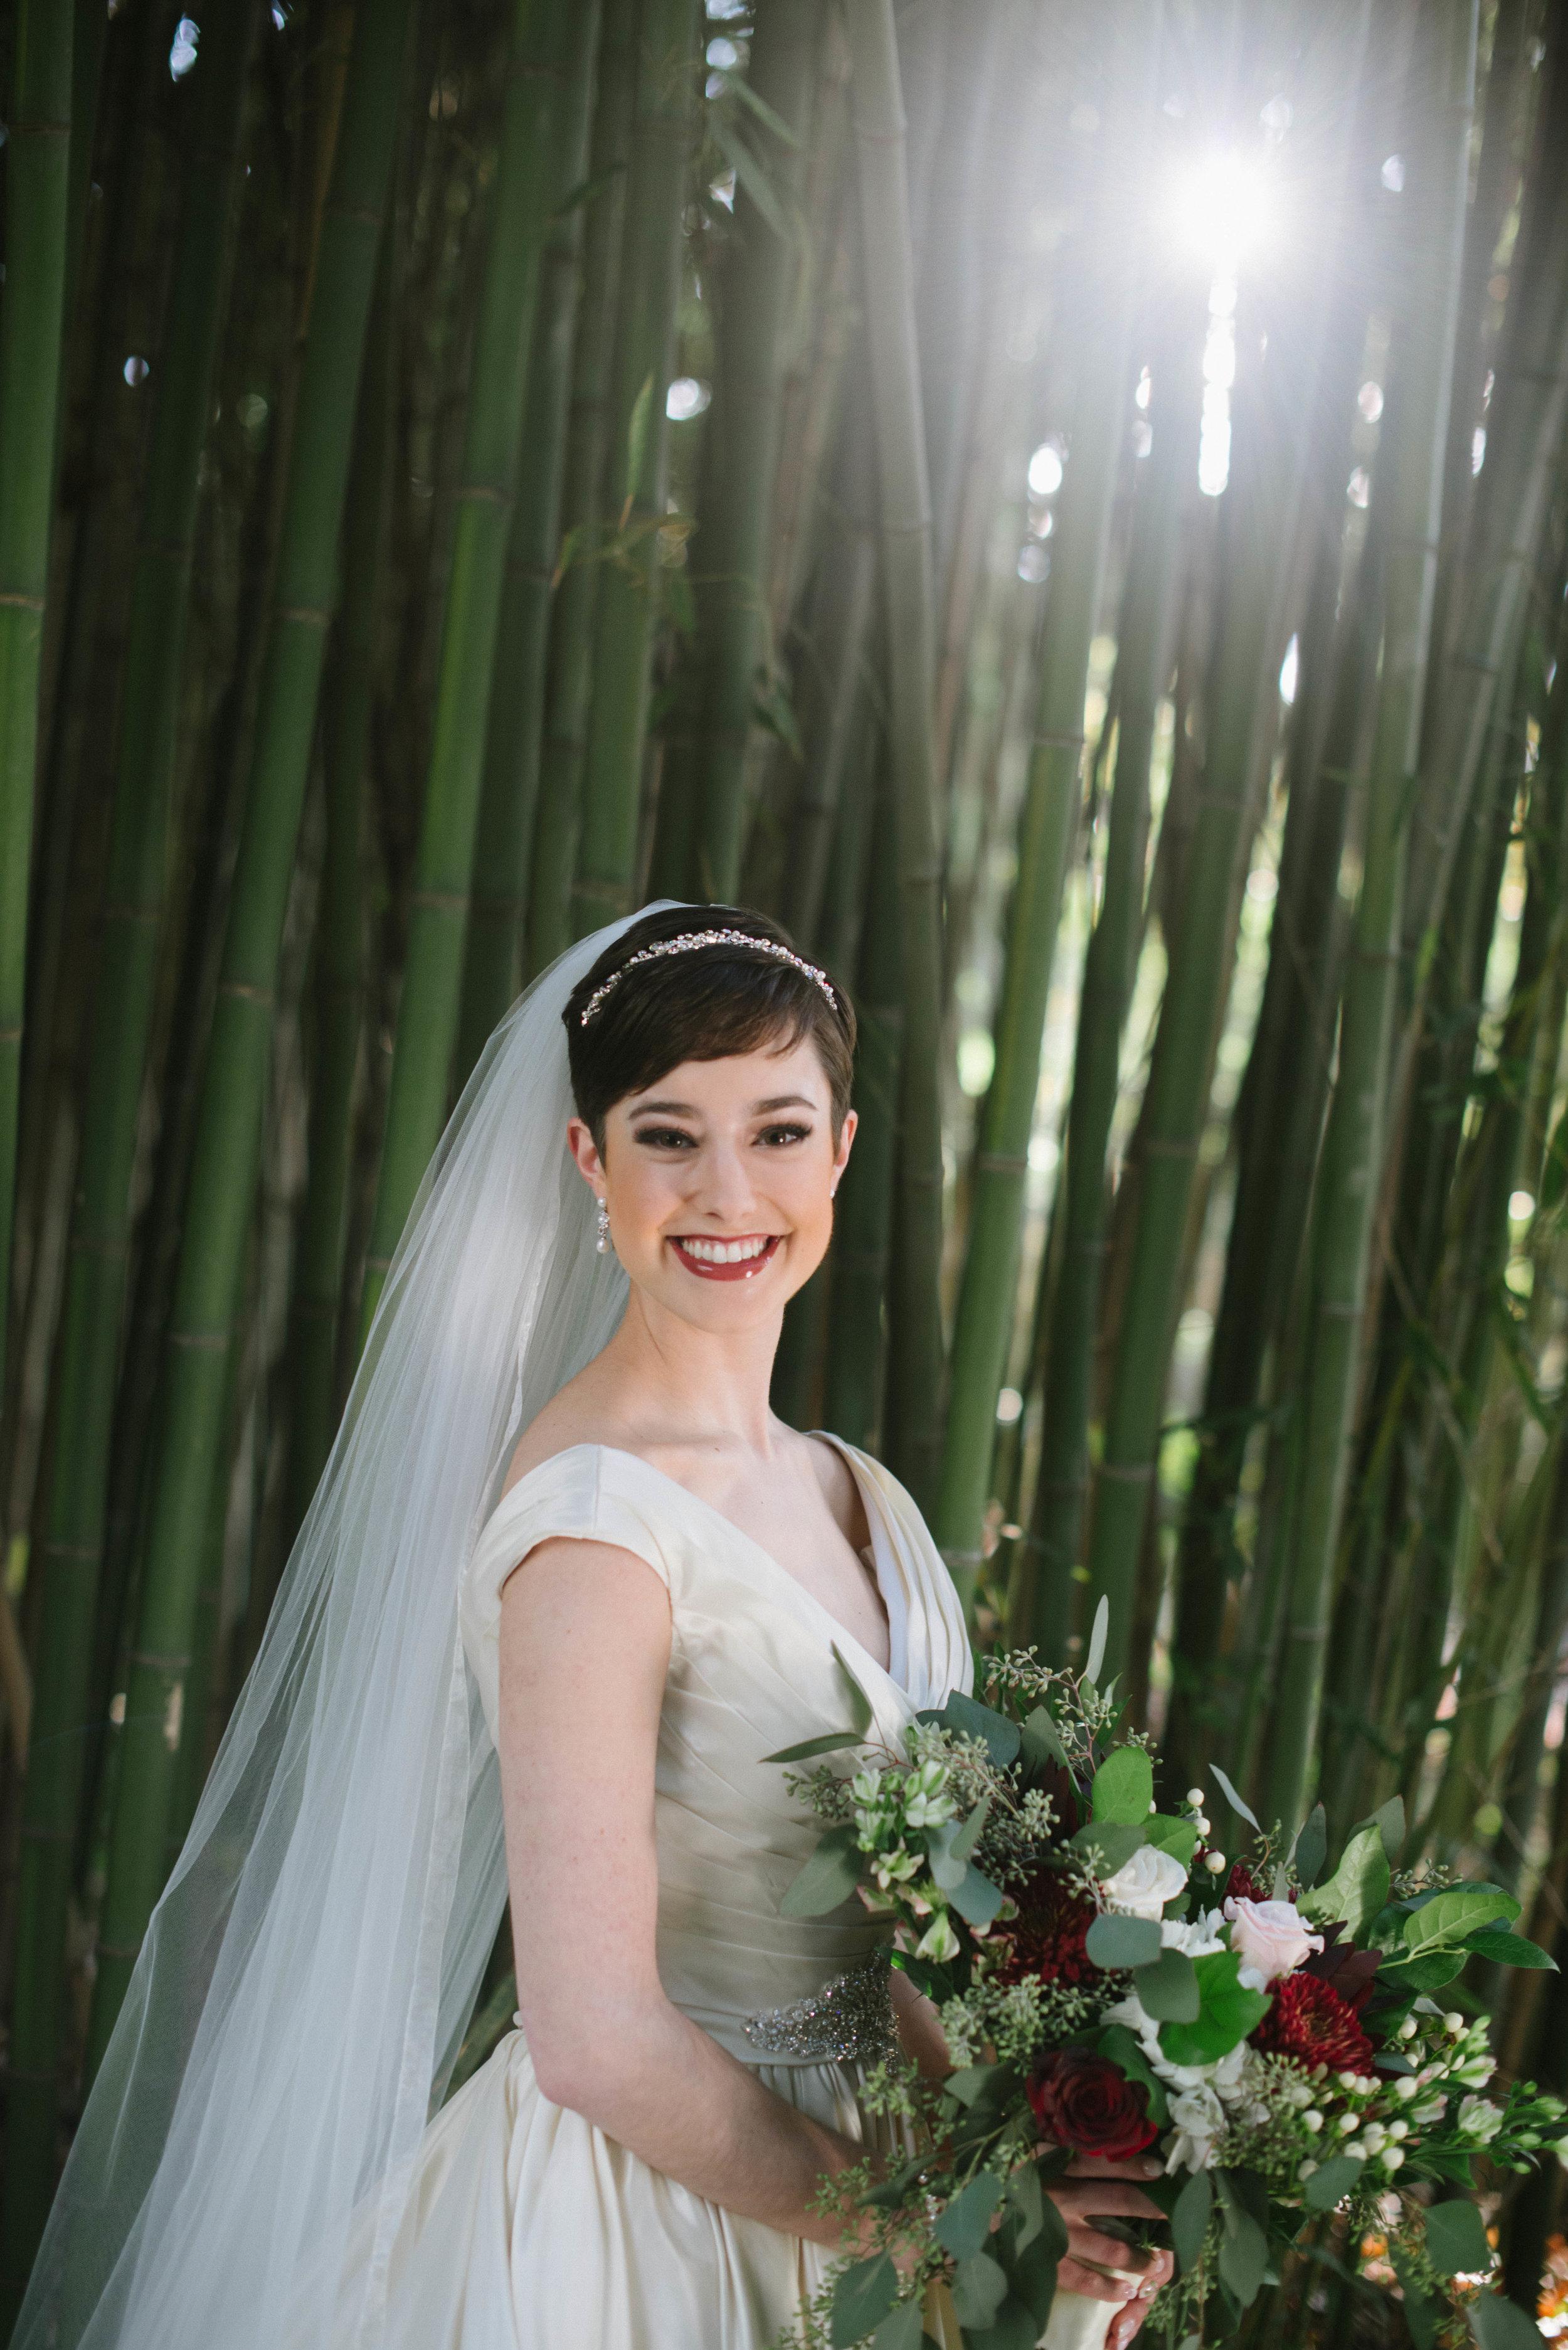 CarolineMerritt|Bridals|_Color_MiraPhotographs-102.jpg